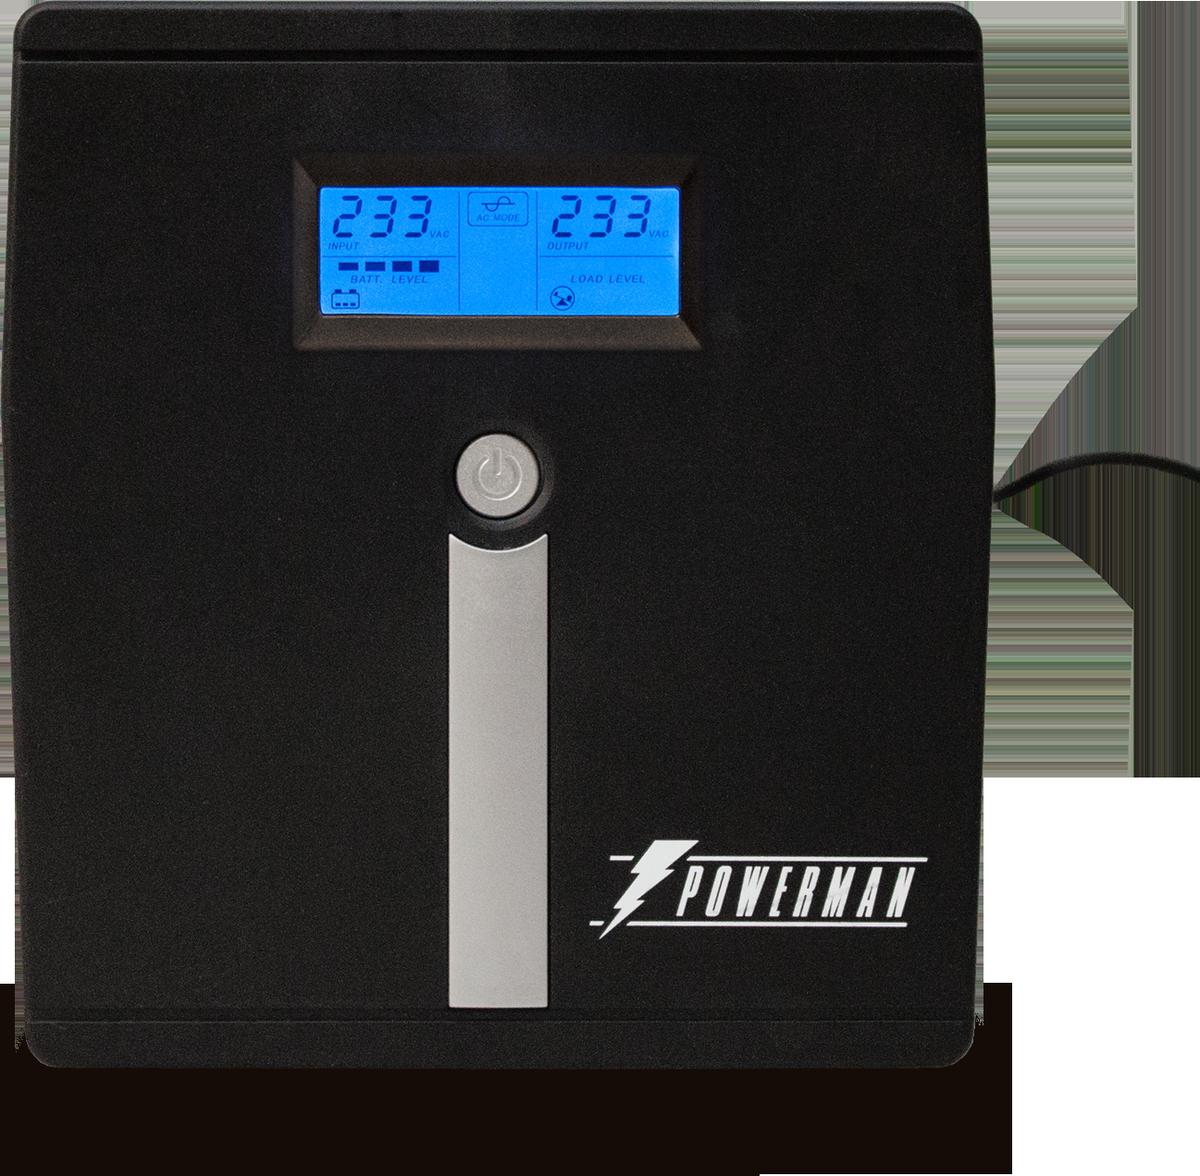 Источник бесперебойного питания Powerman UPS Smart Sine 1000, 1000 ВА источник бесперебойного питания ippon back power pro lcd 600